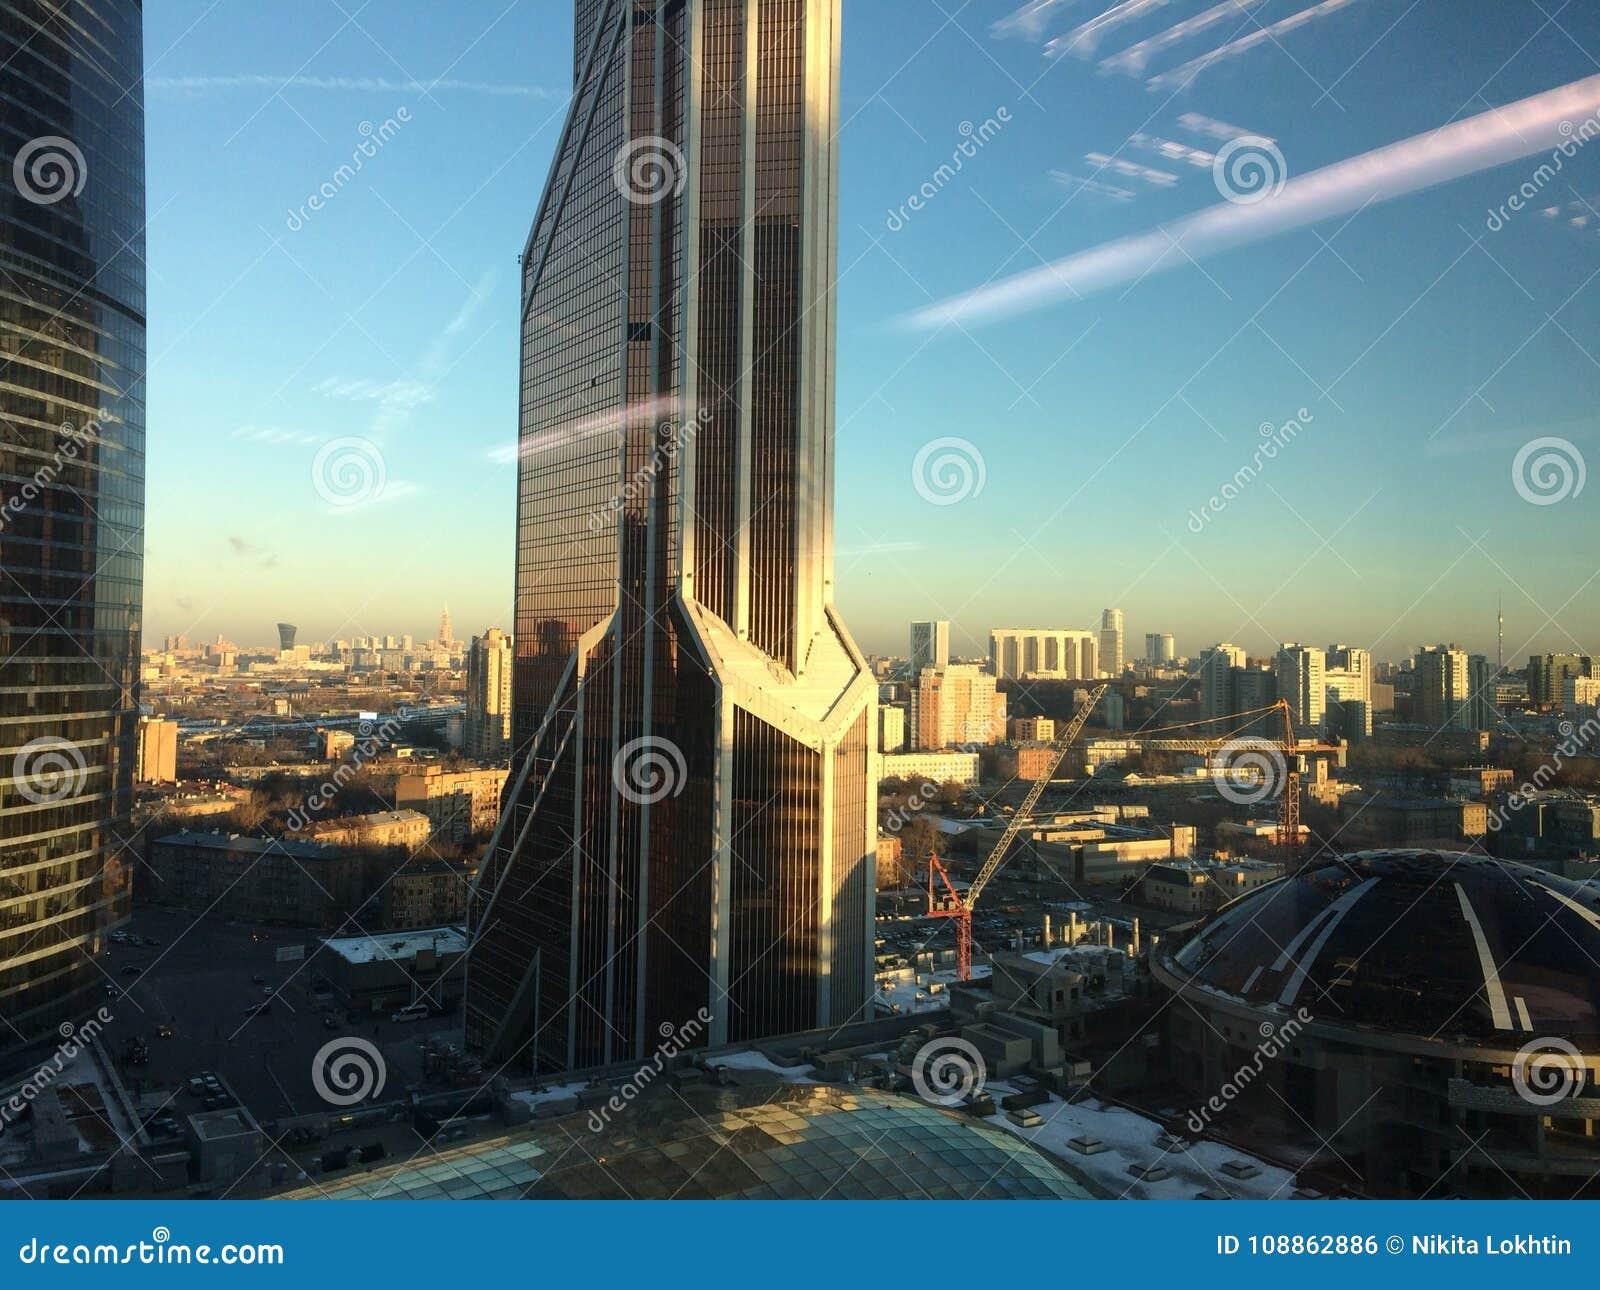 Moskau-Stadtturm-Geschäftszentrum